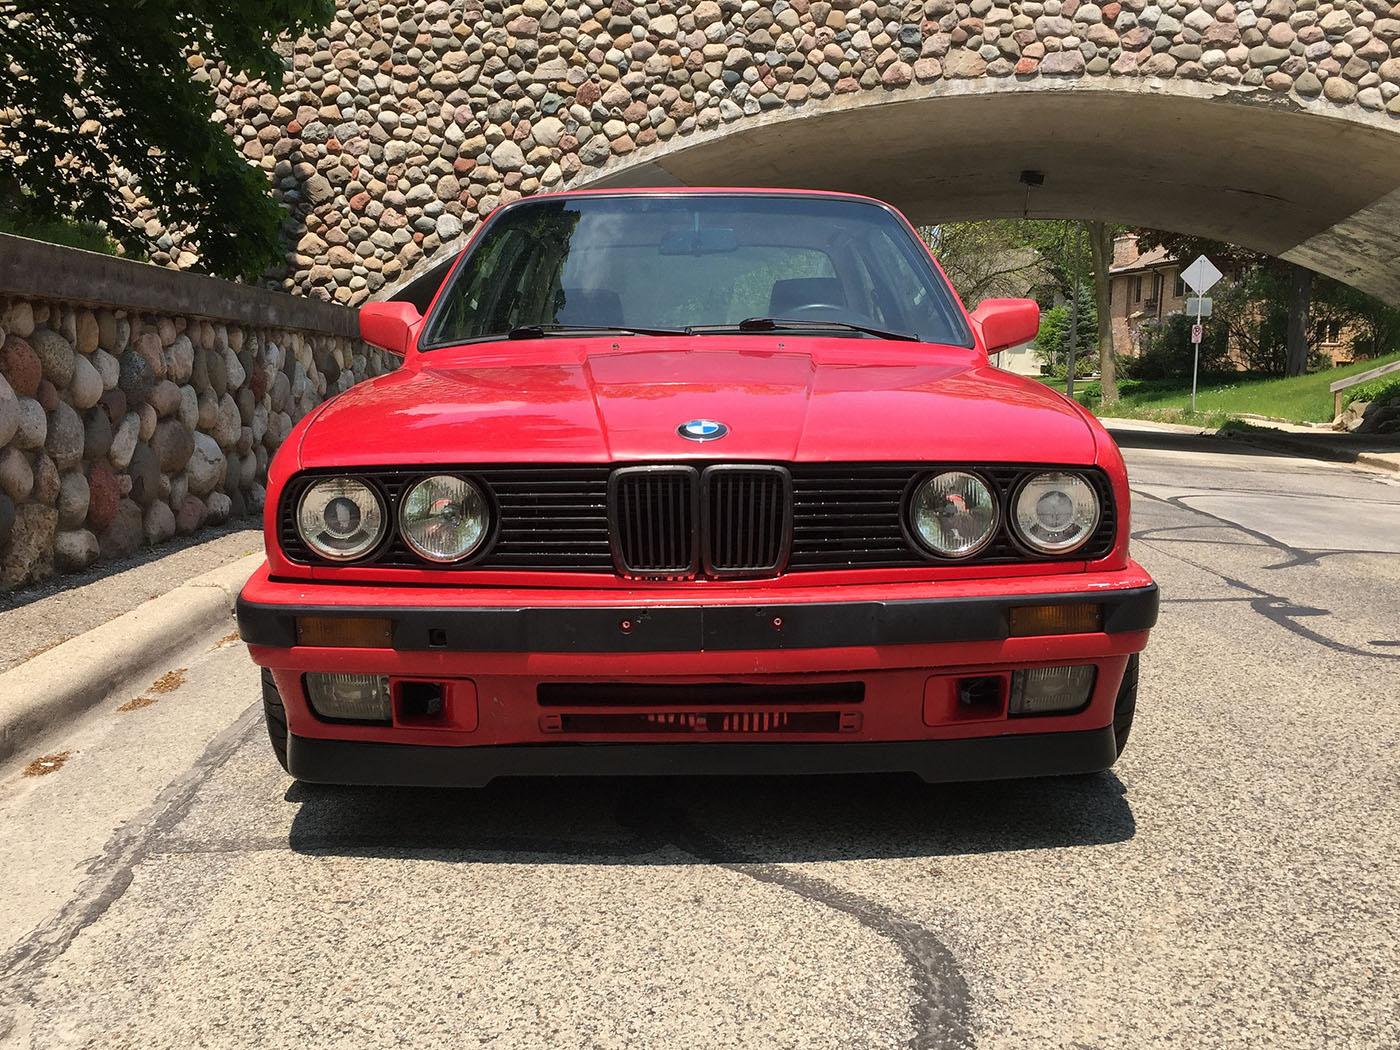 For Sale Bmw E30 With A M62 V8 Engine Swap Depot